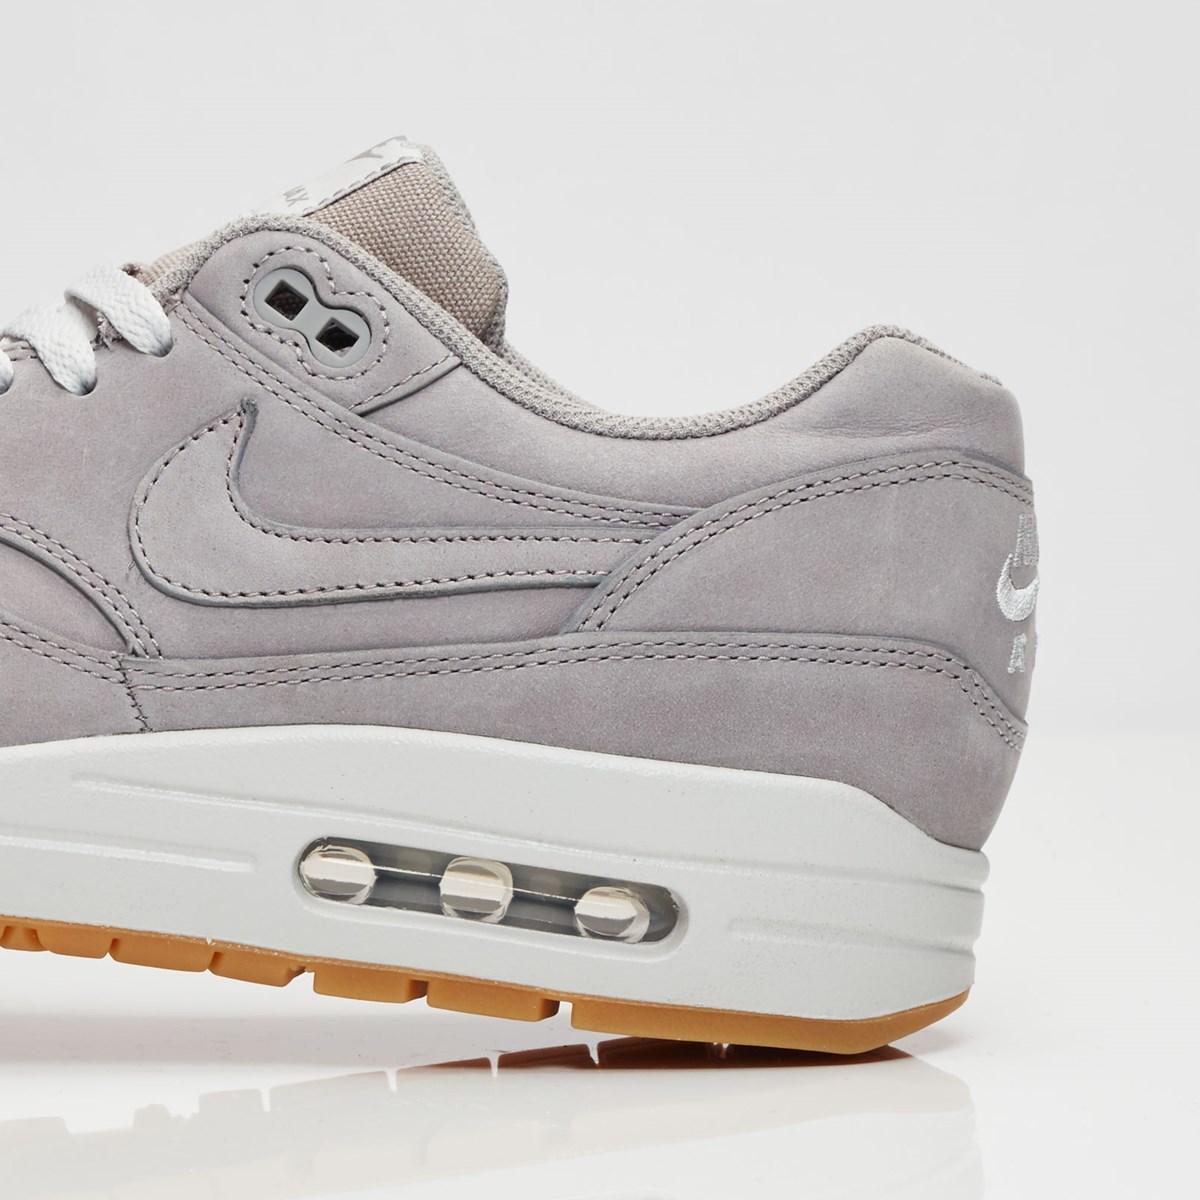 Nike Air Max 1 LTR Premium - 705282-005 - SNS   sneakers & streetwear en ligne depuis 1999